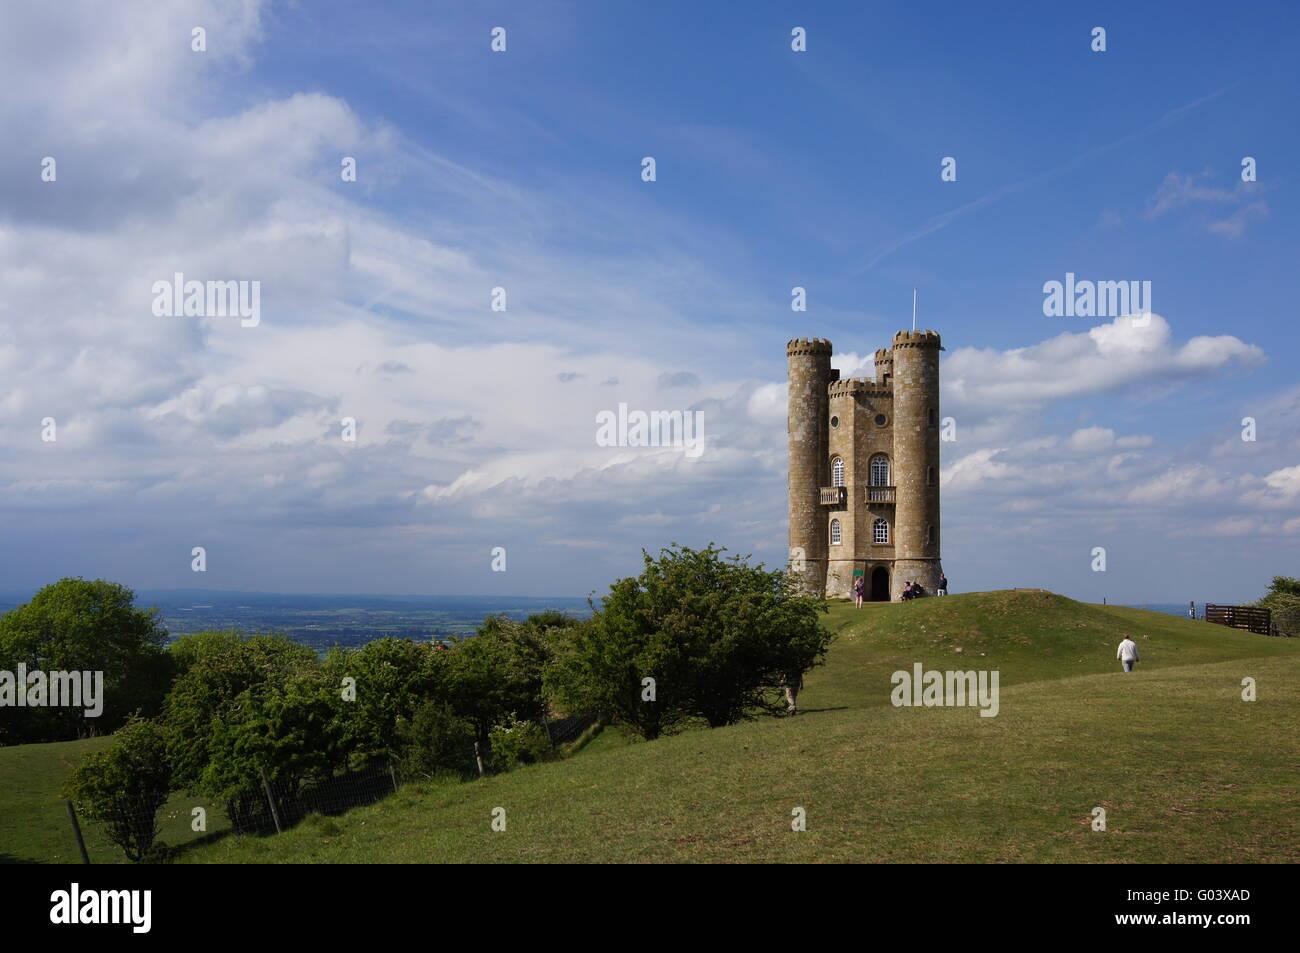 Broadway Tower UK - Stock Image